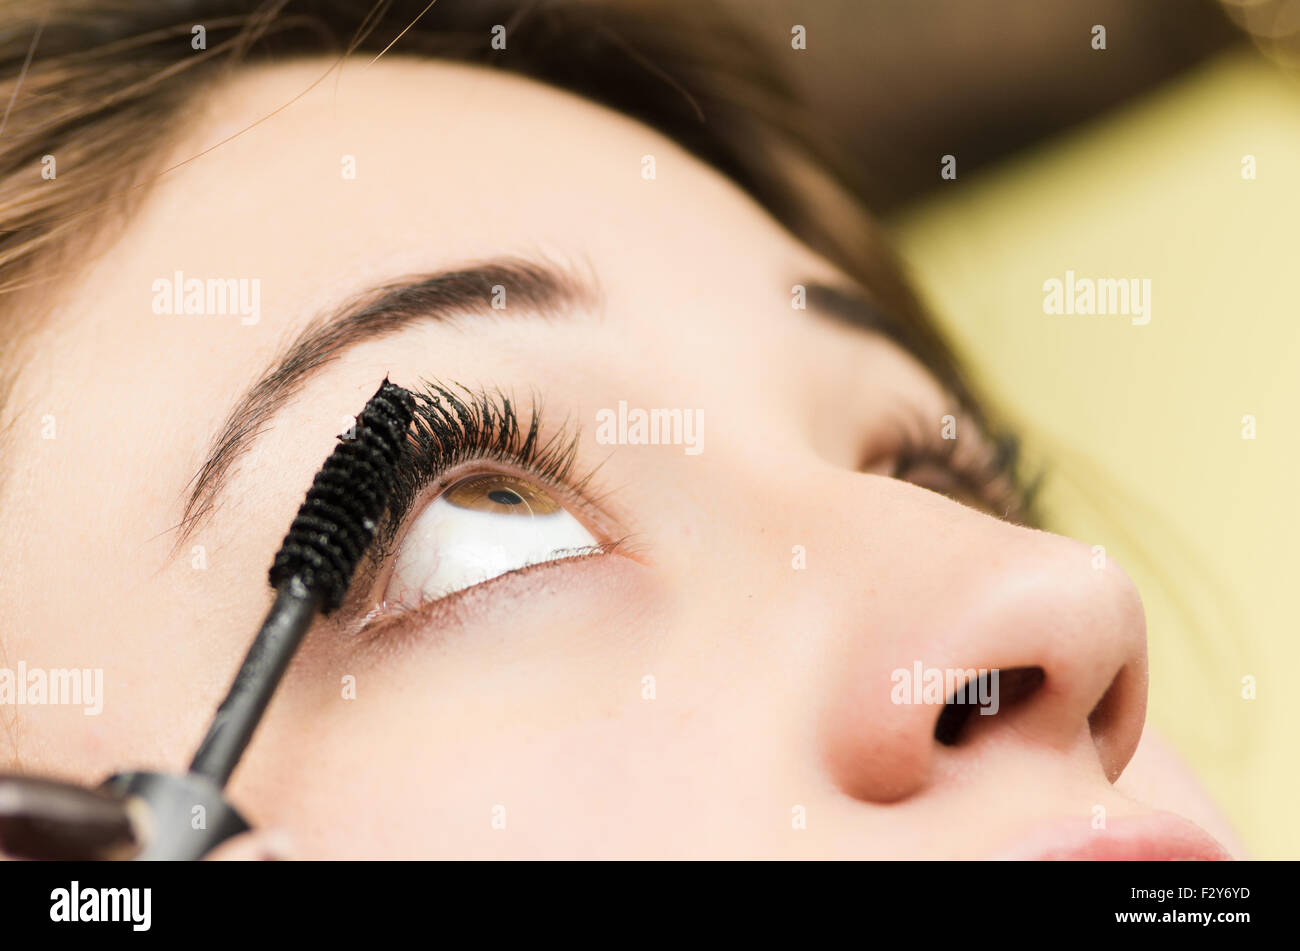 Closeup headshot morena recibiendo tratamiento por maquillaje estilista profesional aplicar mascara de pestañas Imagen De Stock